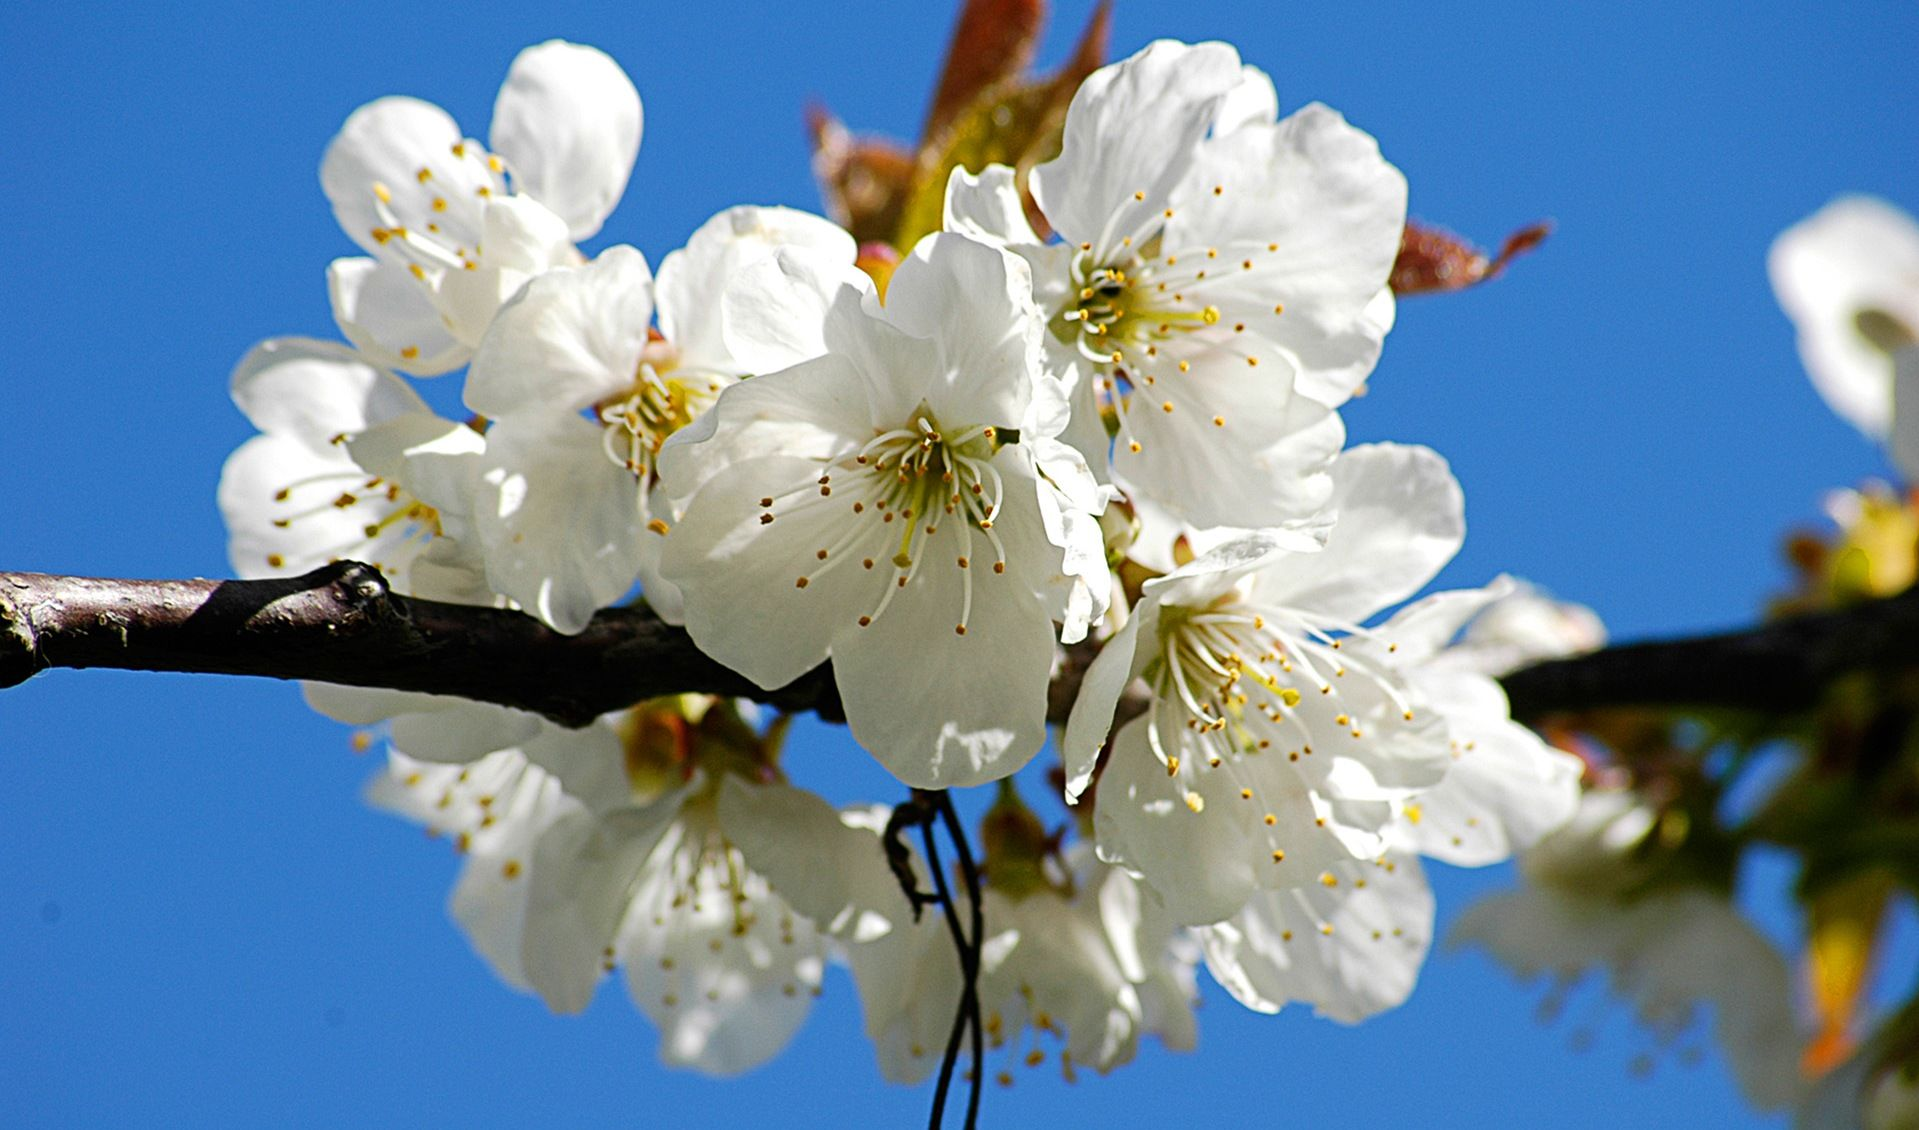 Florakart Plant Nursery Buy Plants Online In India White Cherry Blossom Bloom Flowers